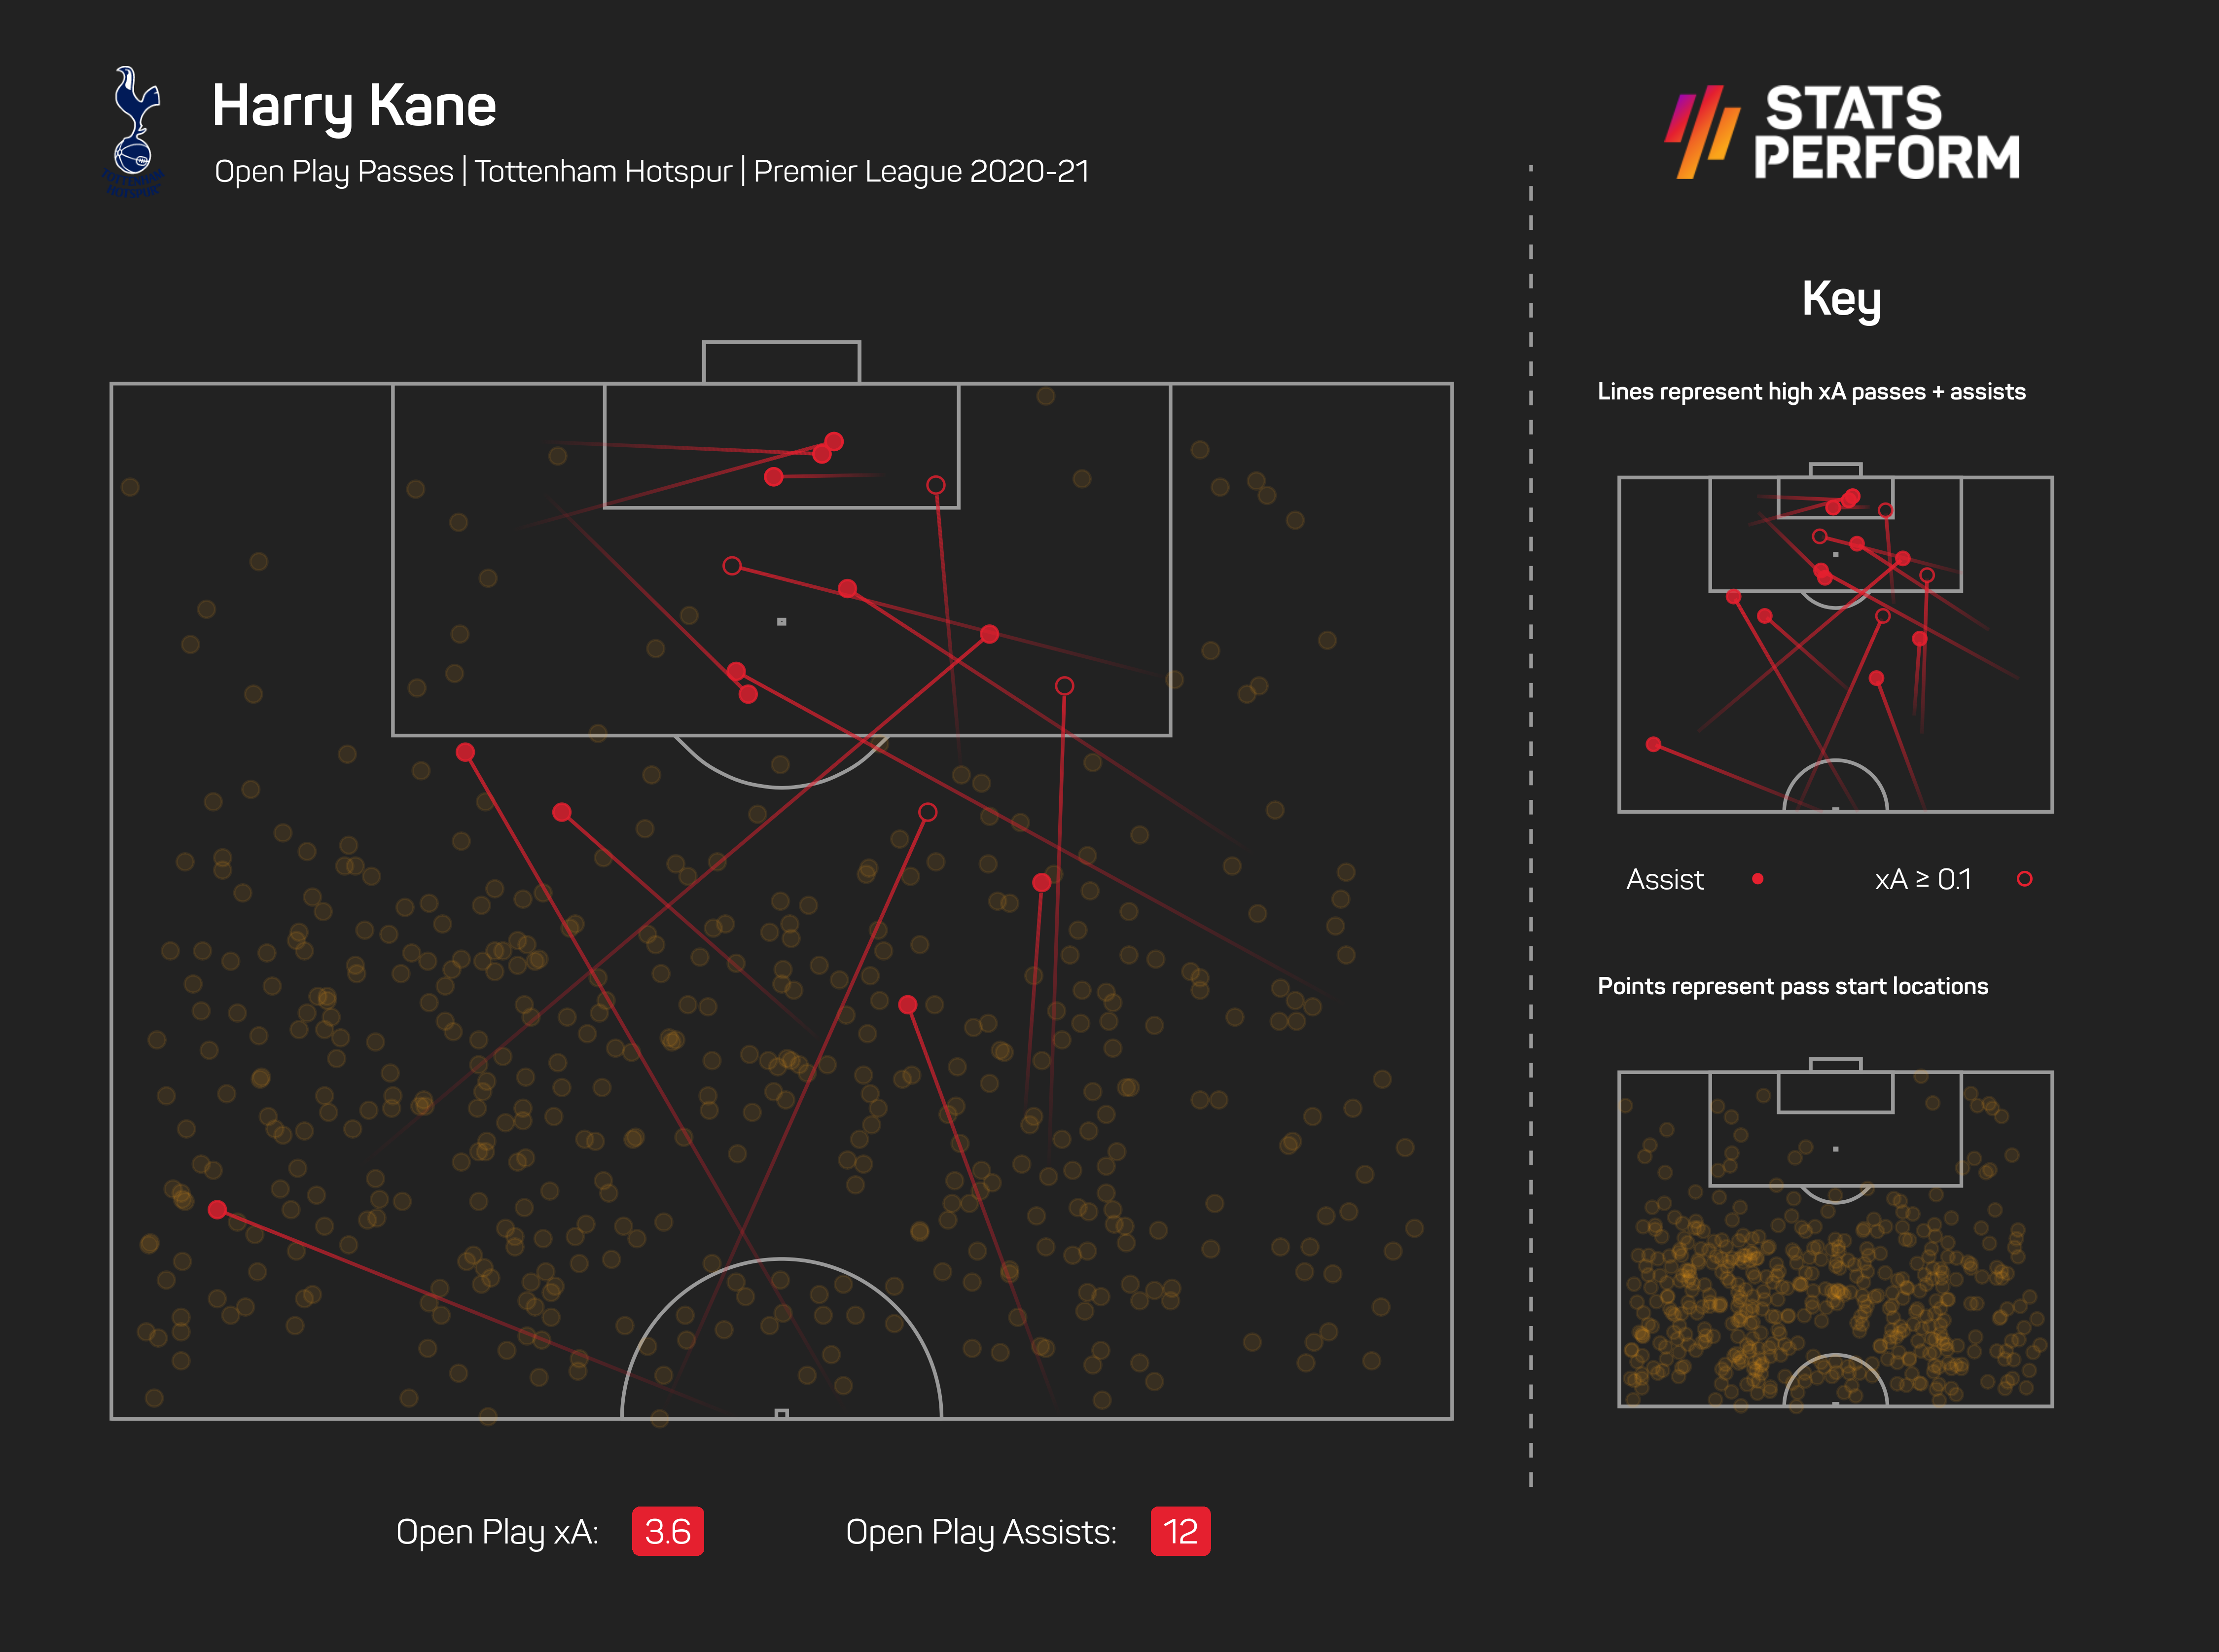 Kane displayed great creativity with Spurs last season